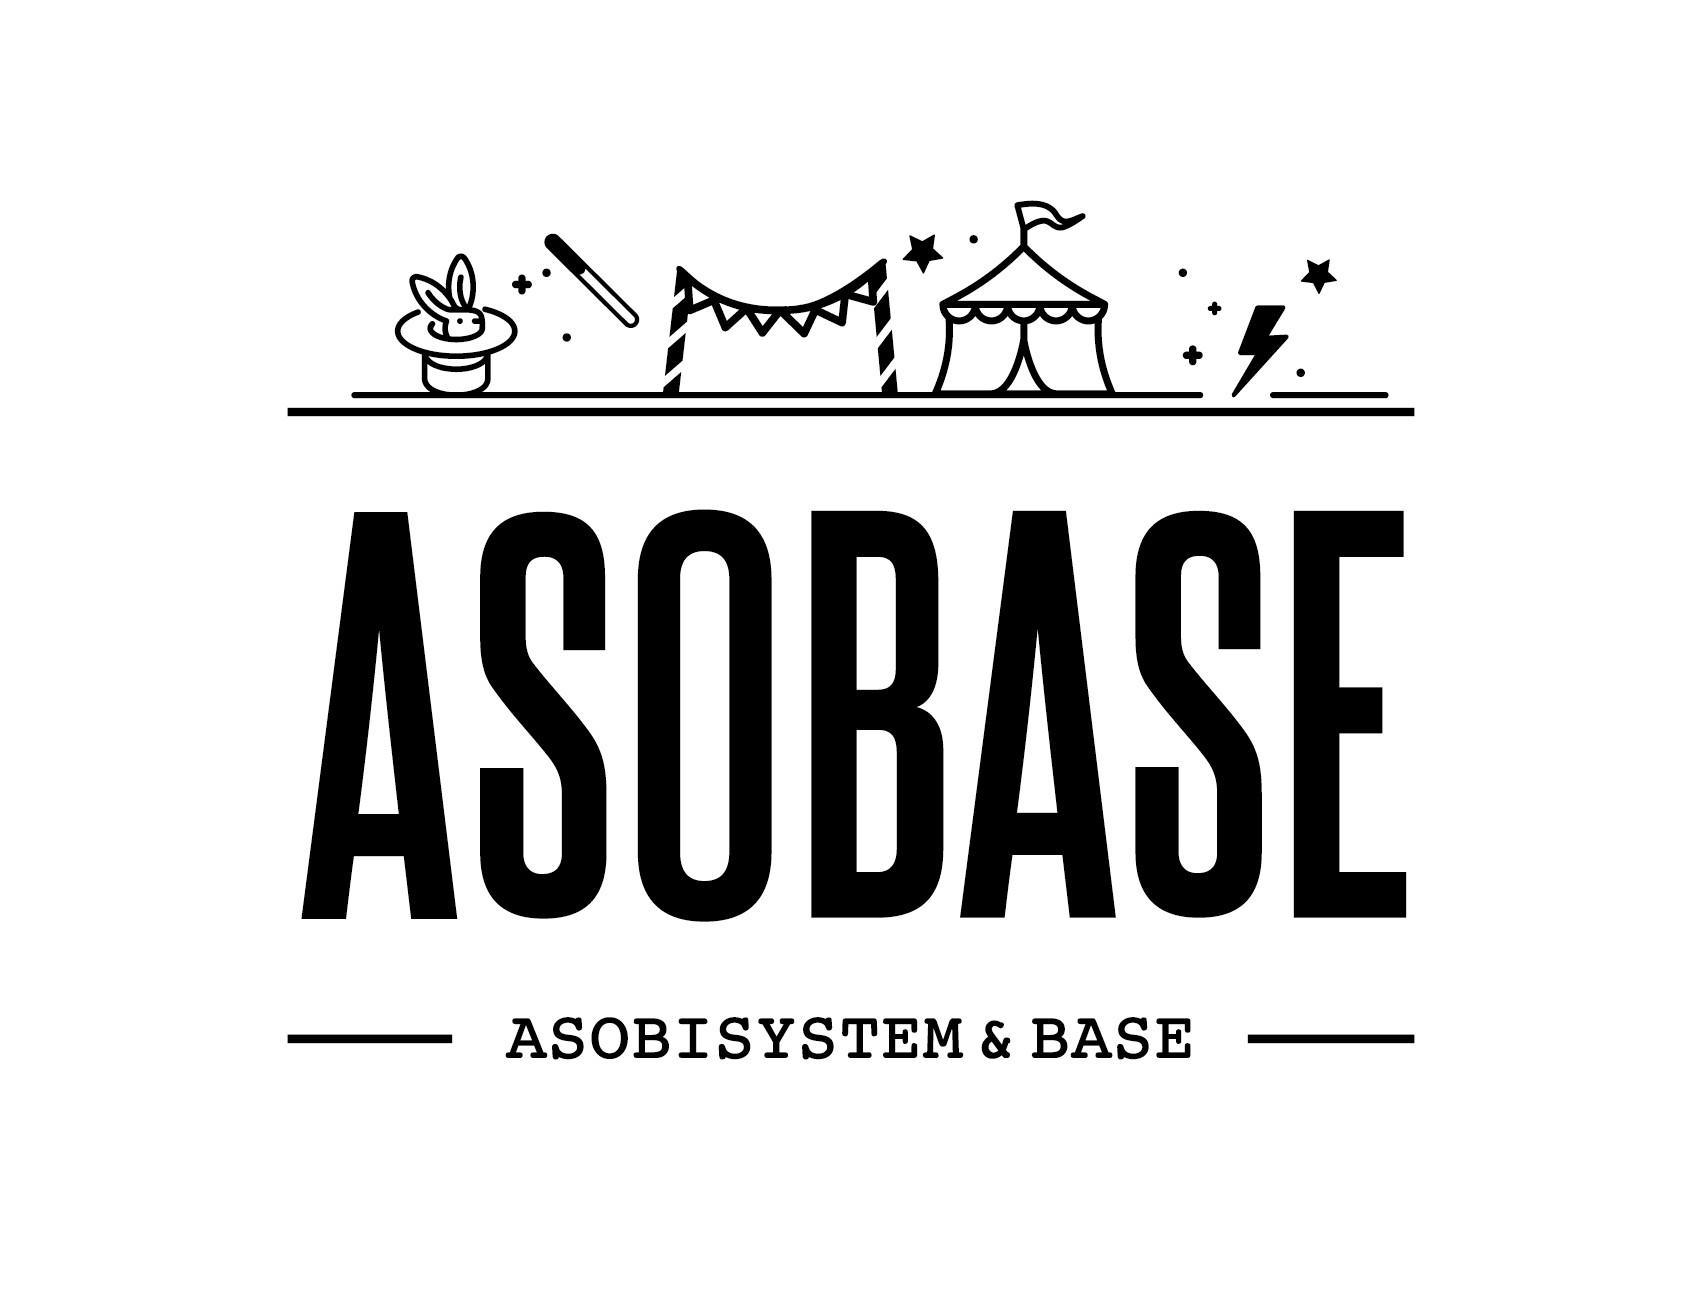 ASOBASE vol.2 出店のお知らせ